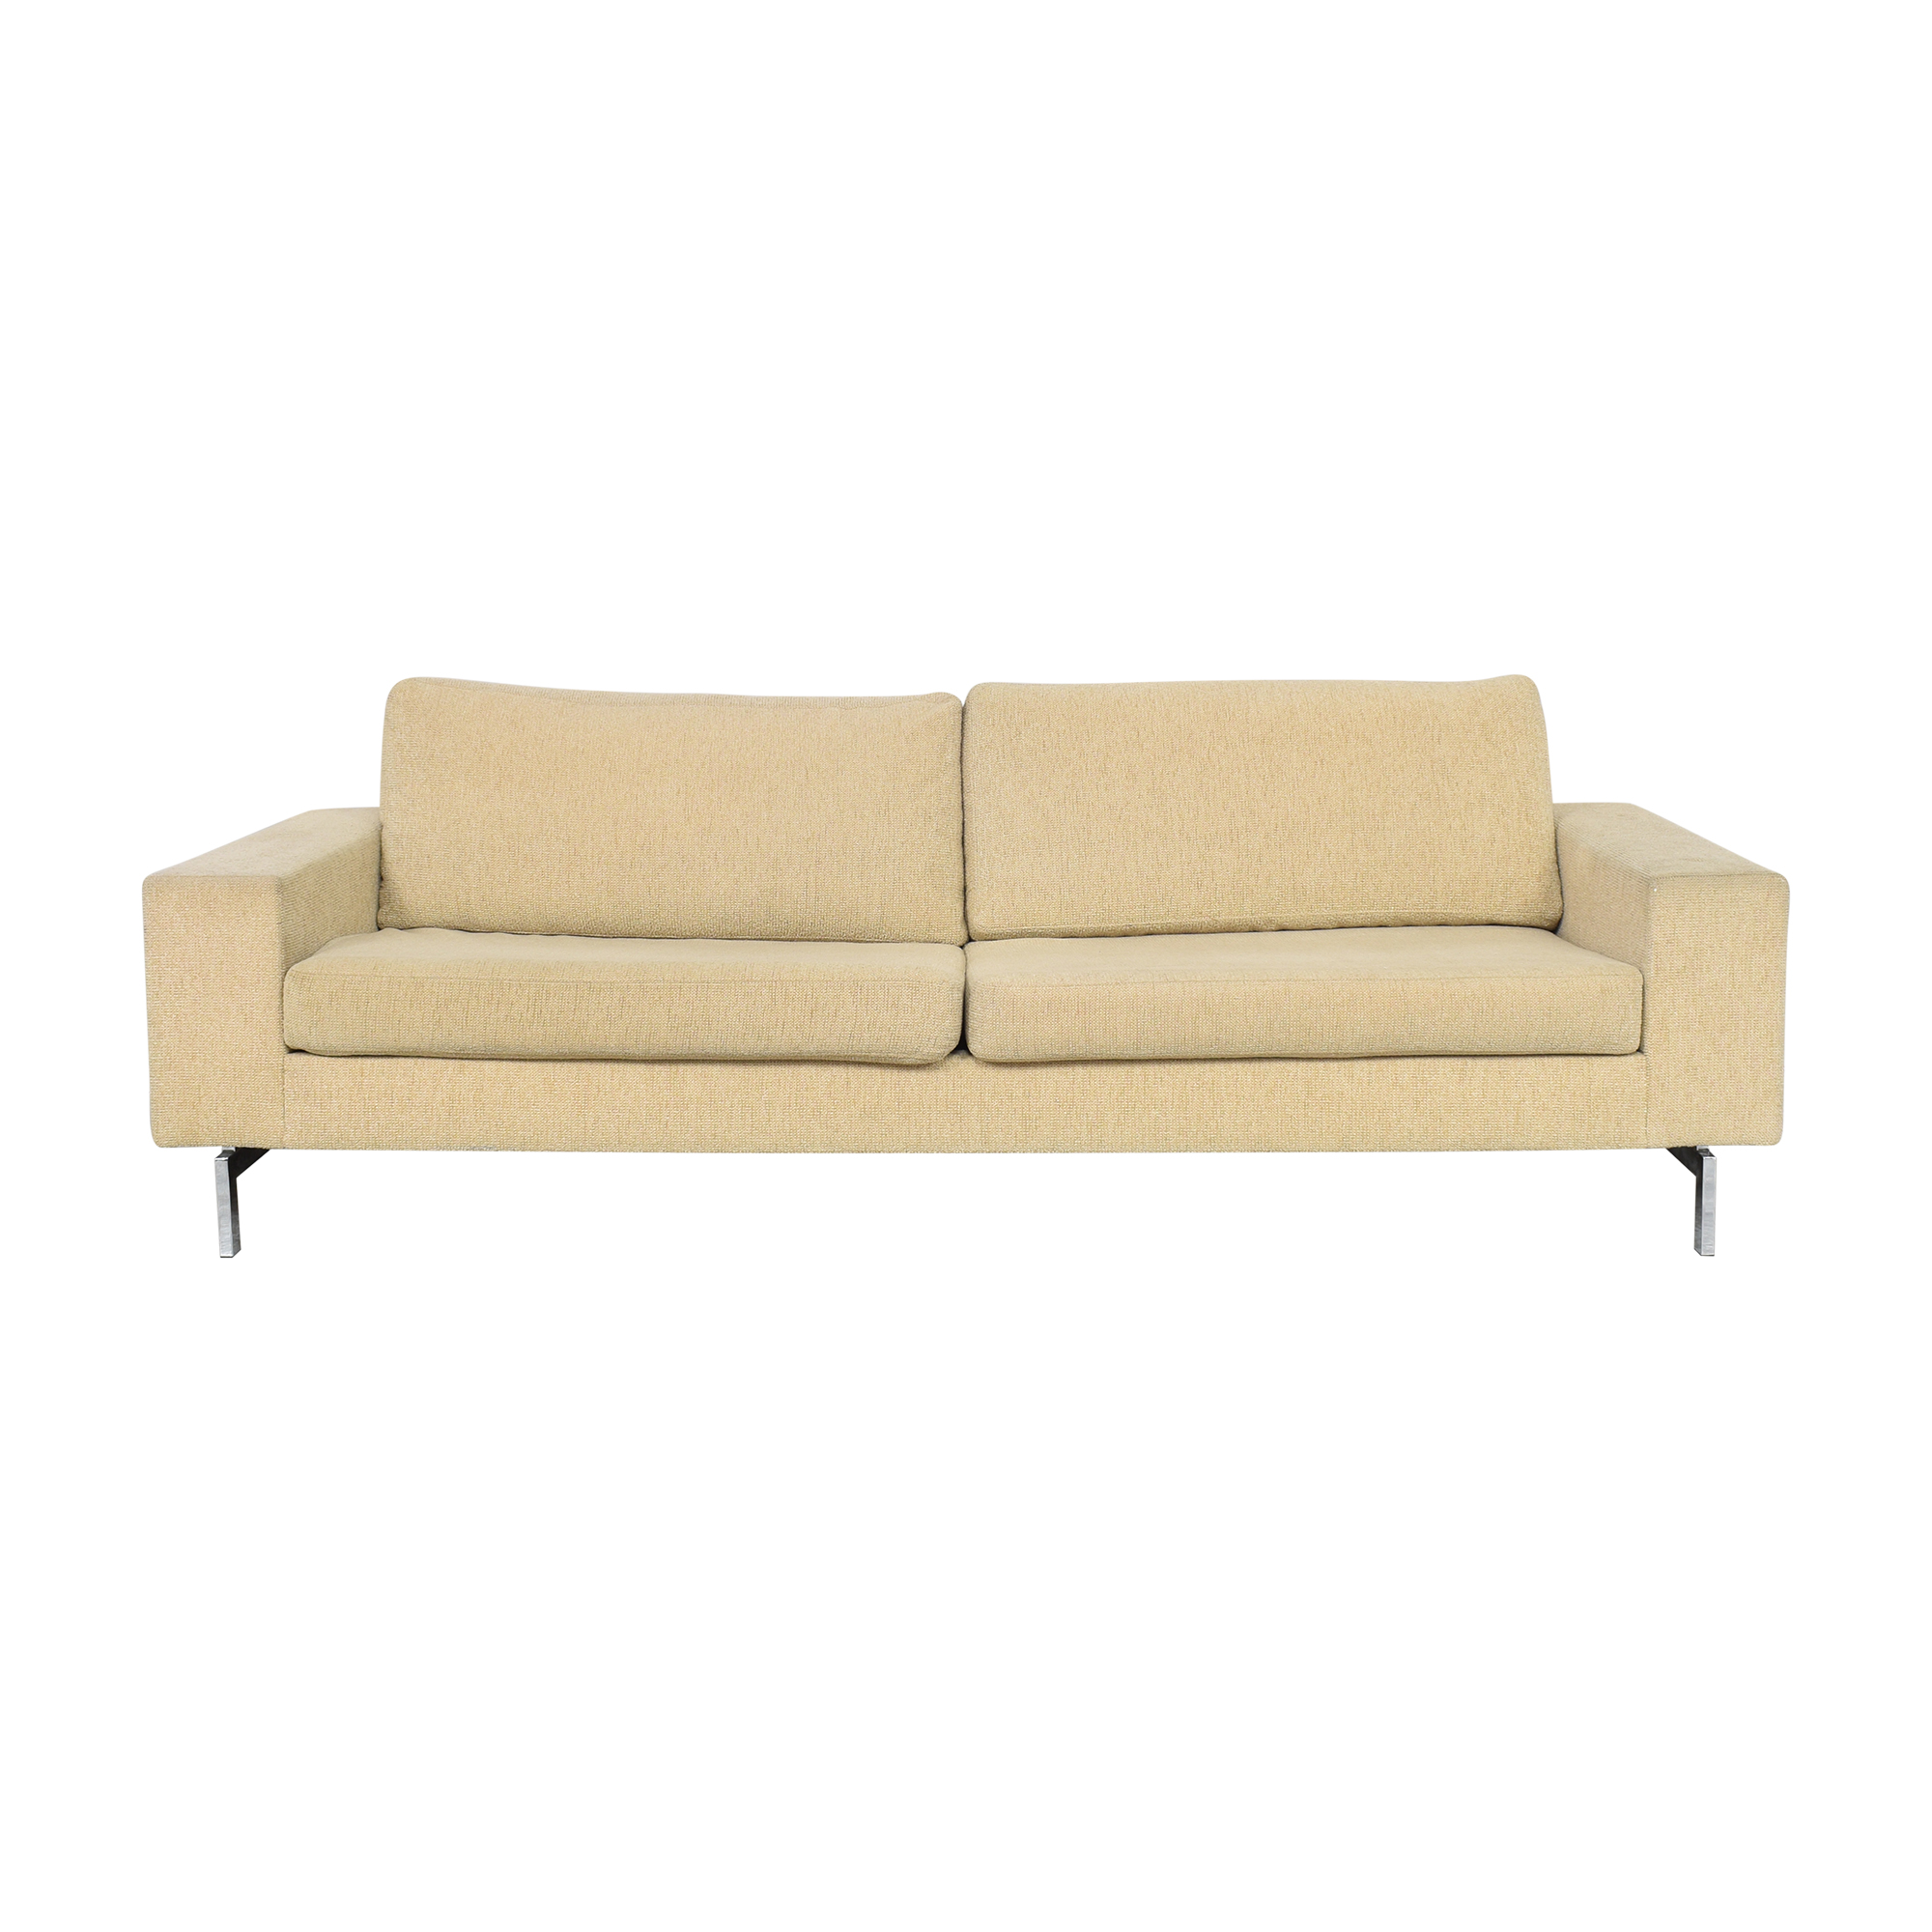 buy  Modern Two Cushion Sofa online